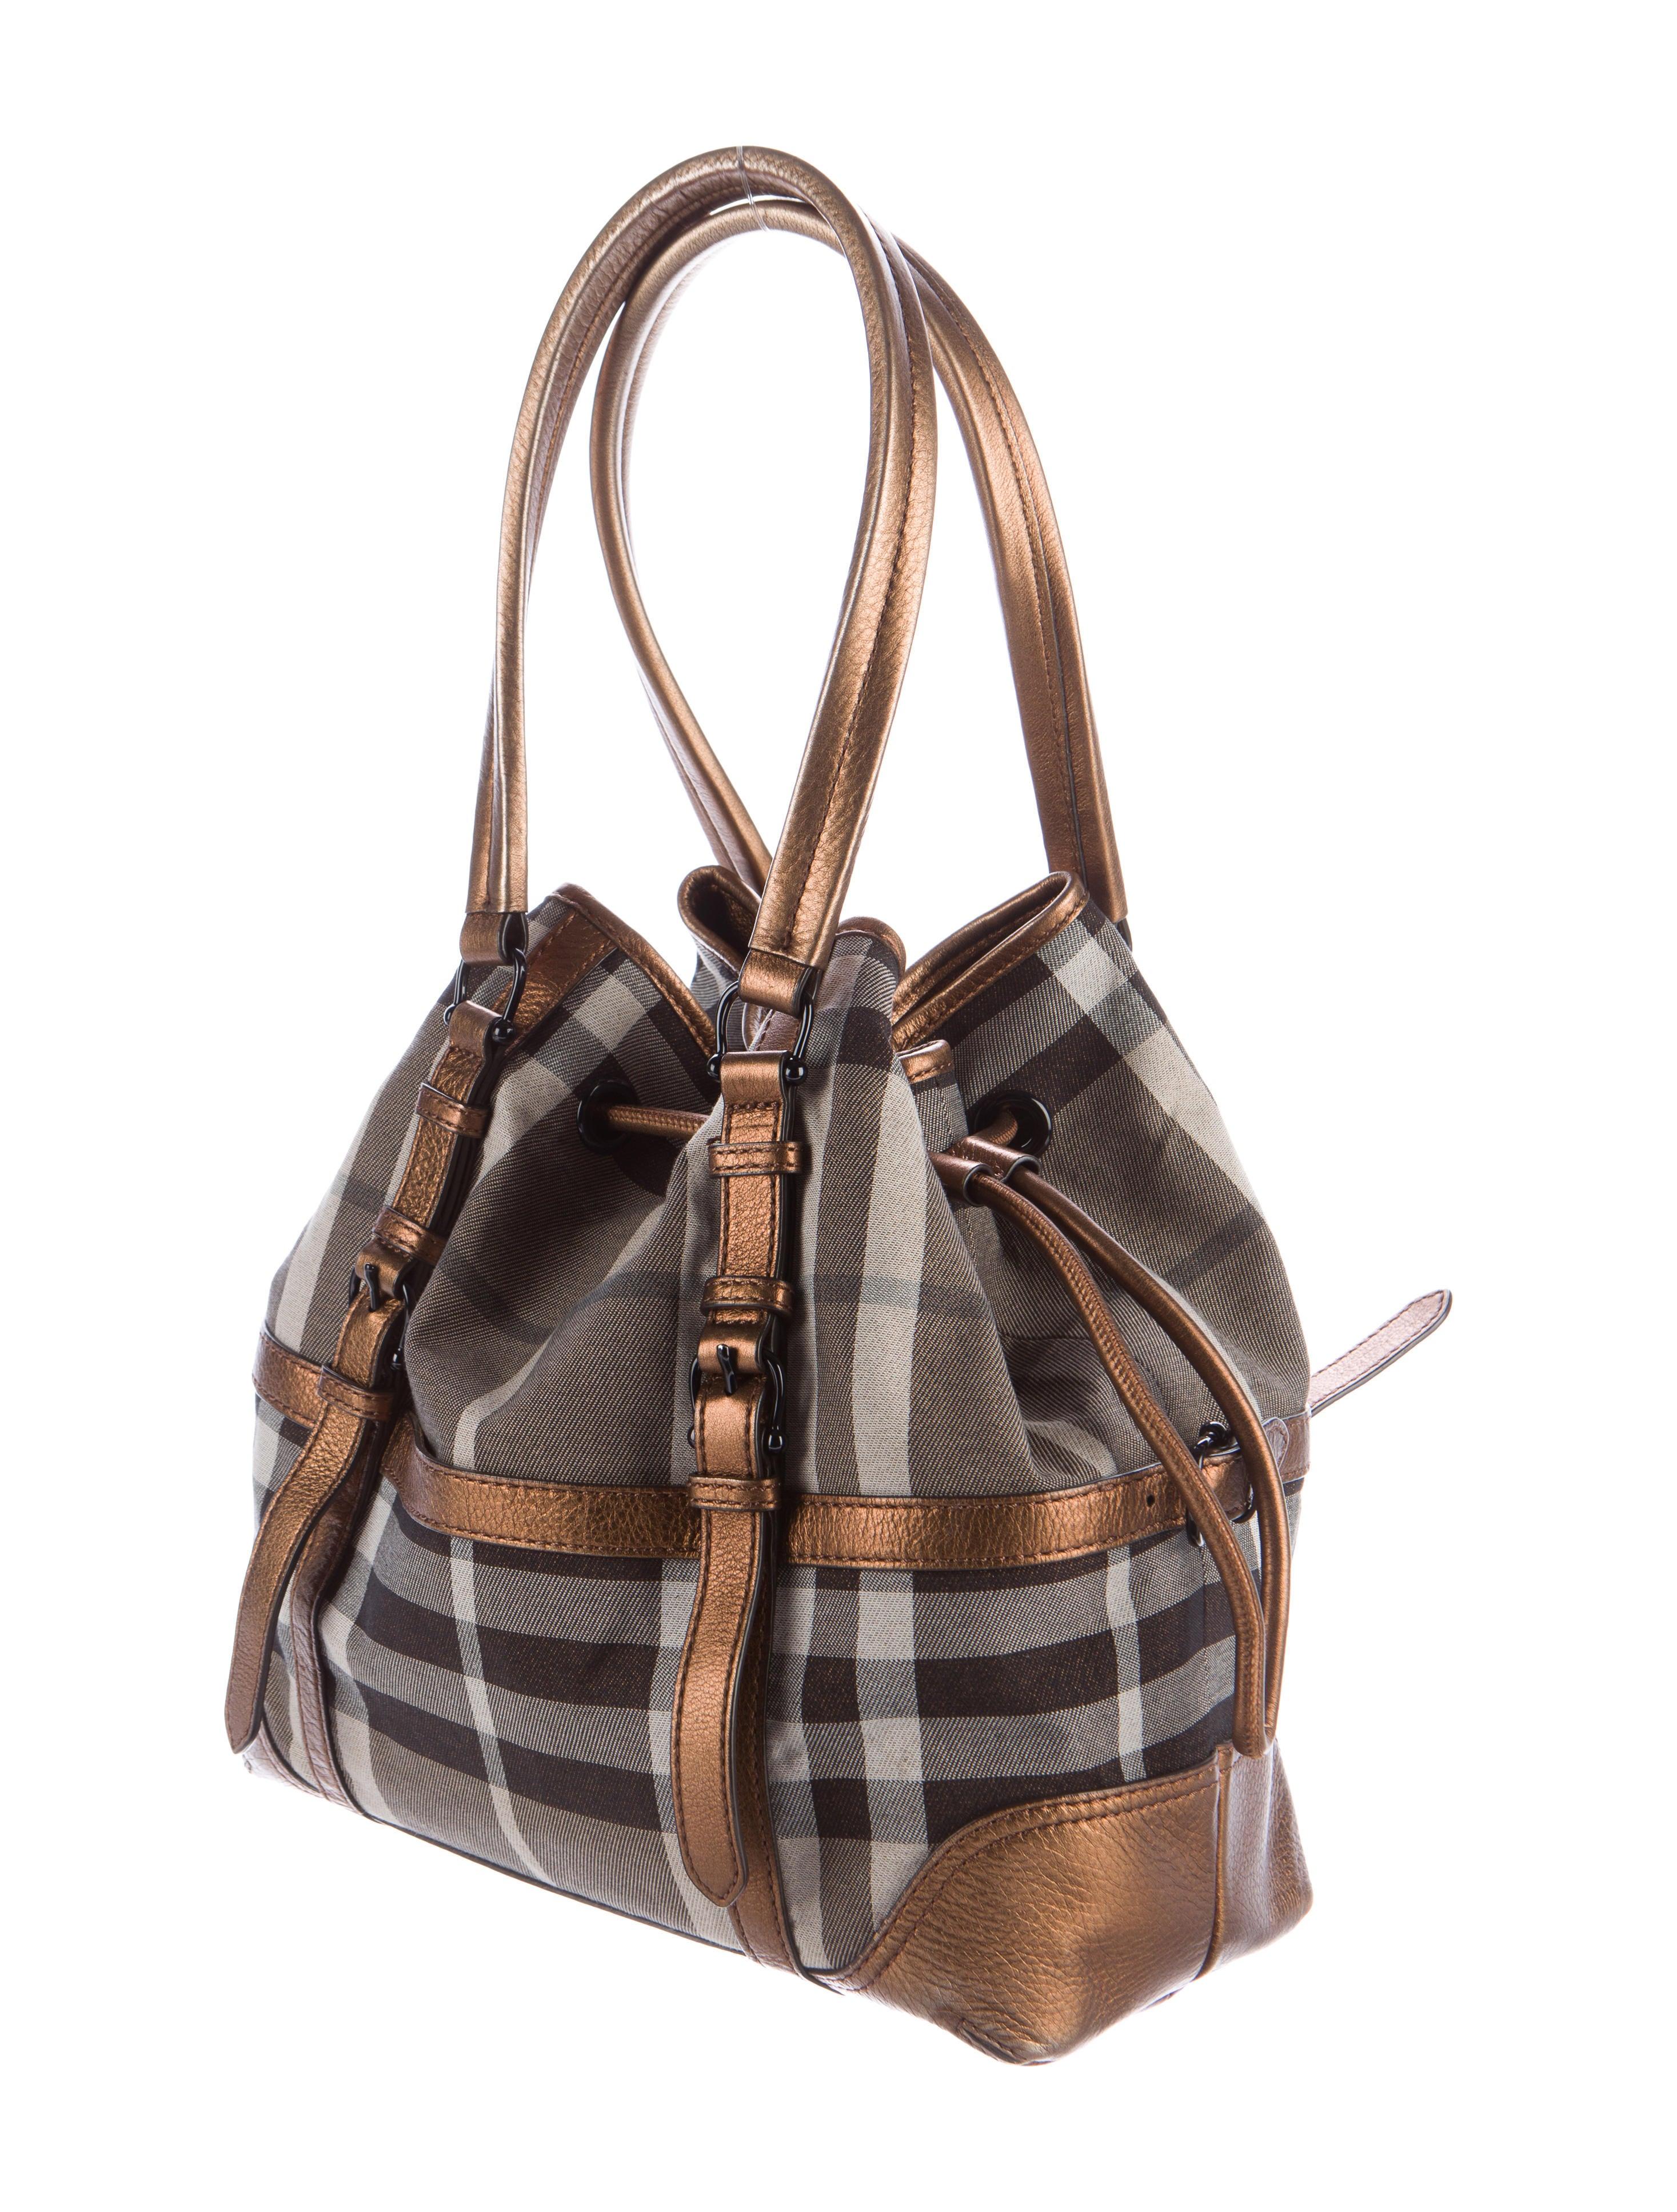 Burberry Smoked Check Shoulder Bag - Handbags - BUR74329 ...